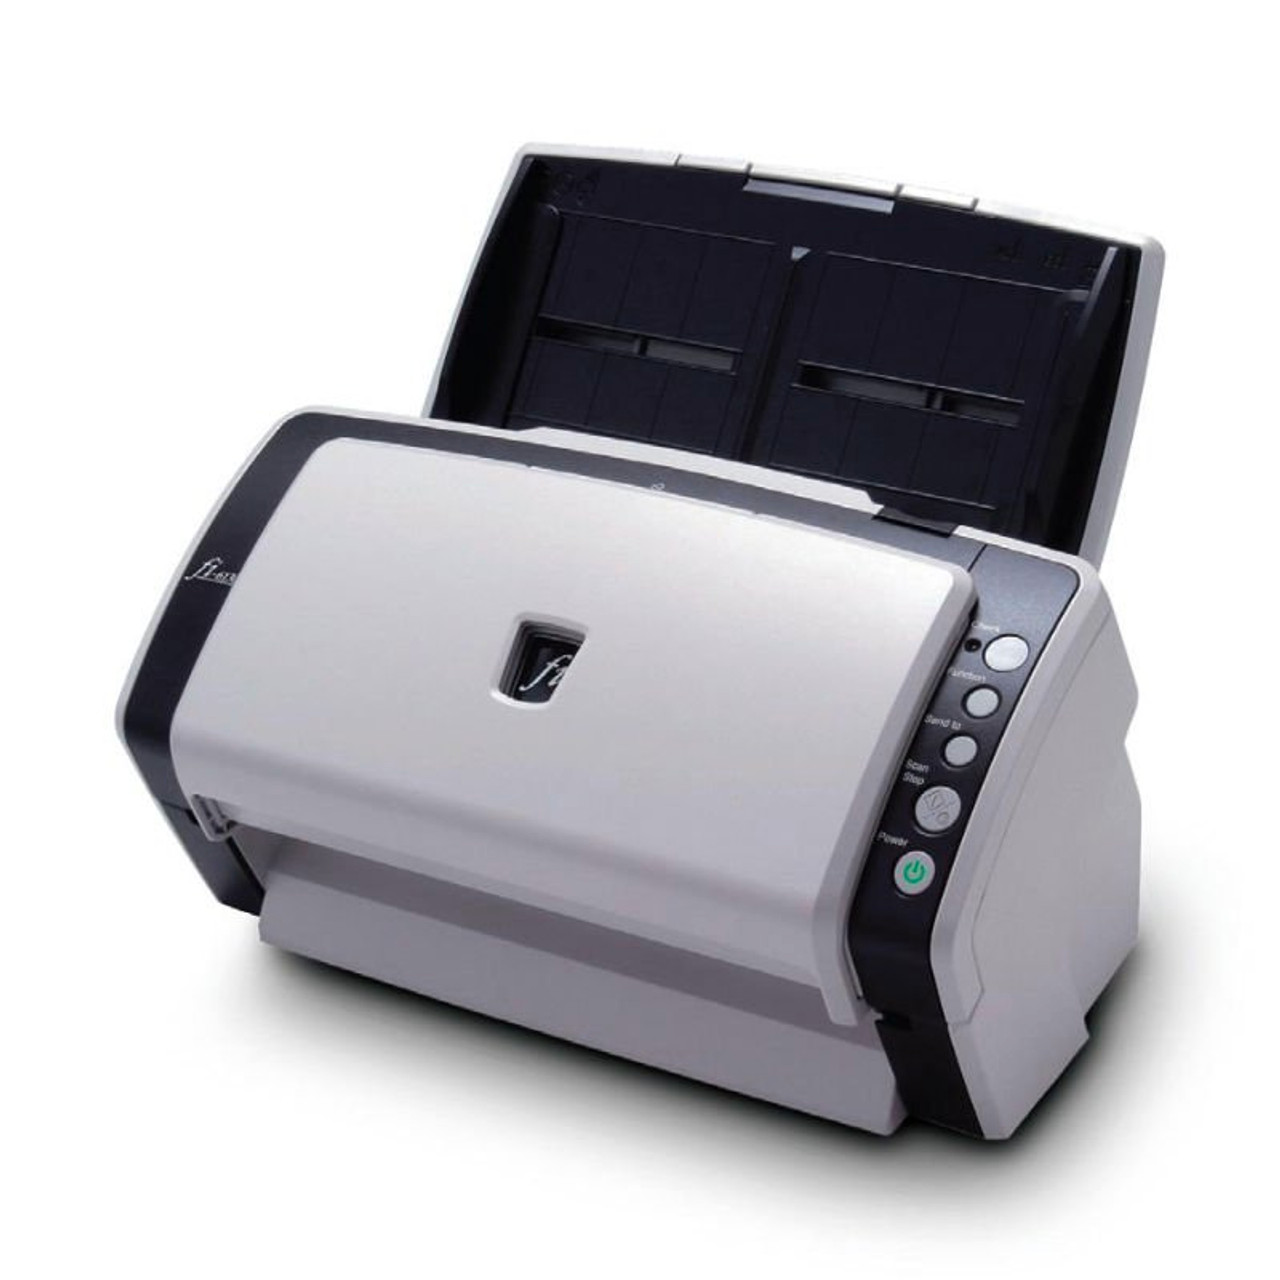 Fujitsu fi 6130C - 600 dpi x 600 dpi - Document scanner